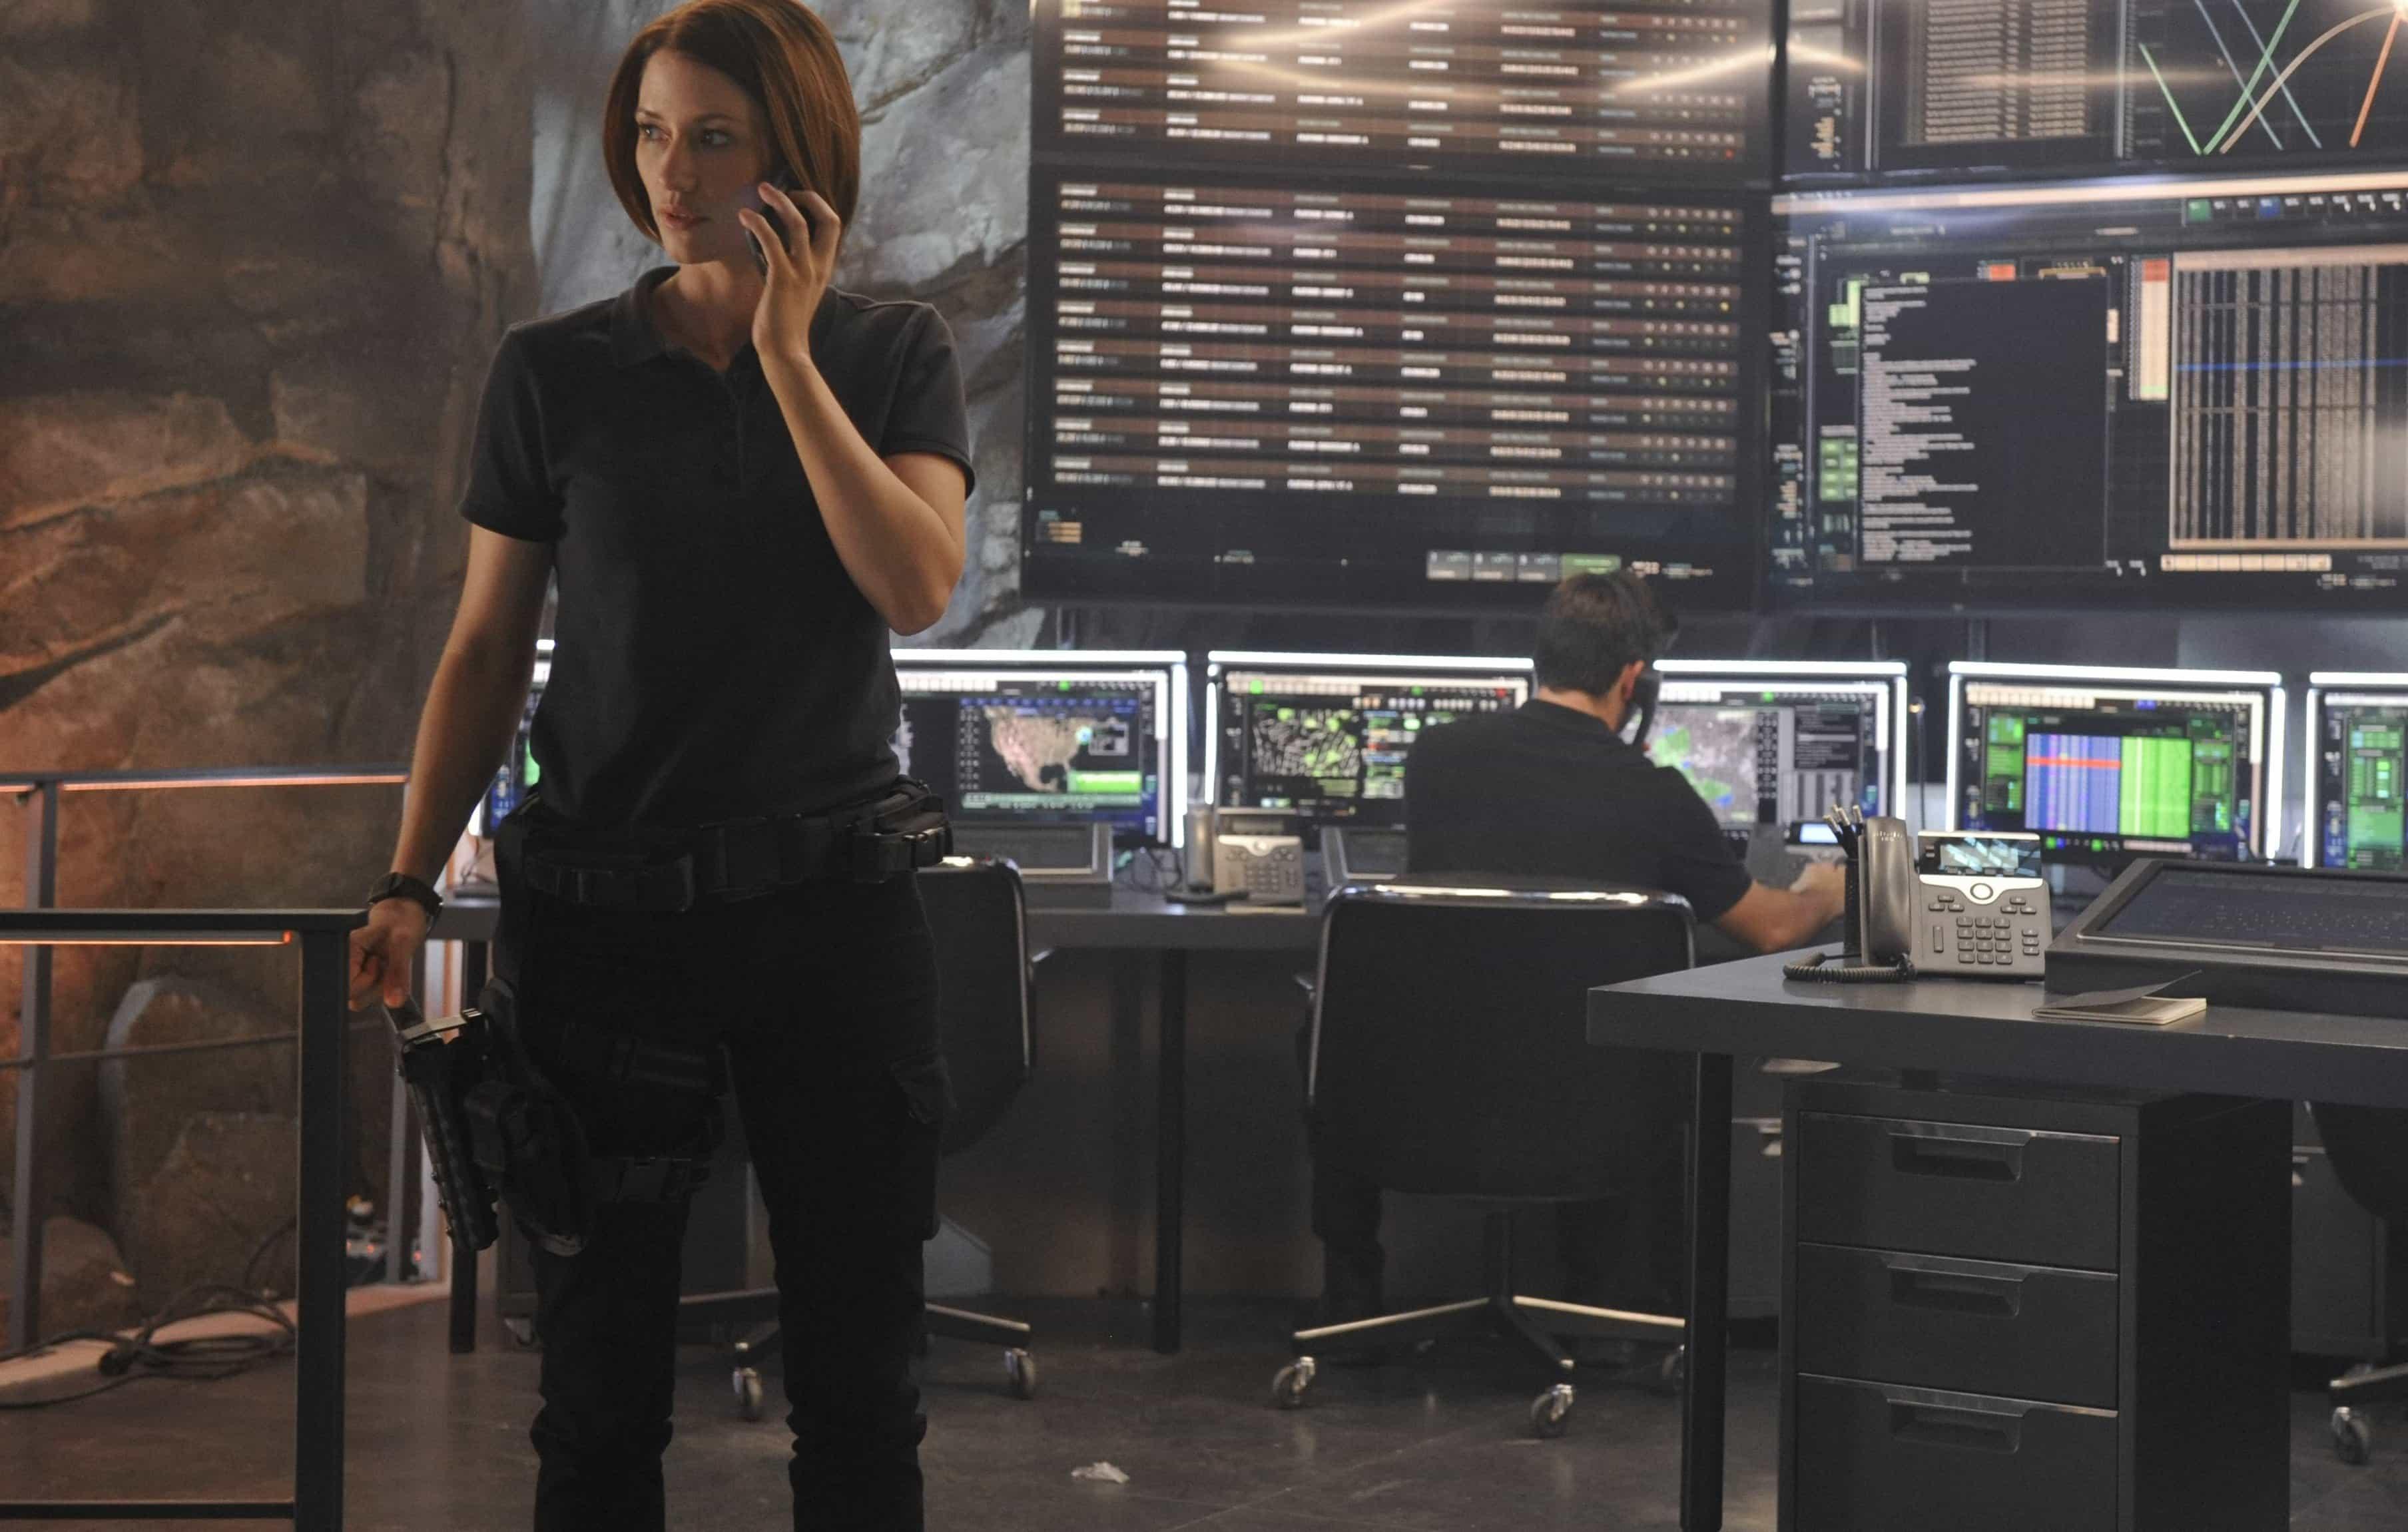 Alex Danvers Supergirl, Hay una lesbiana en mi sopa